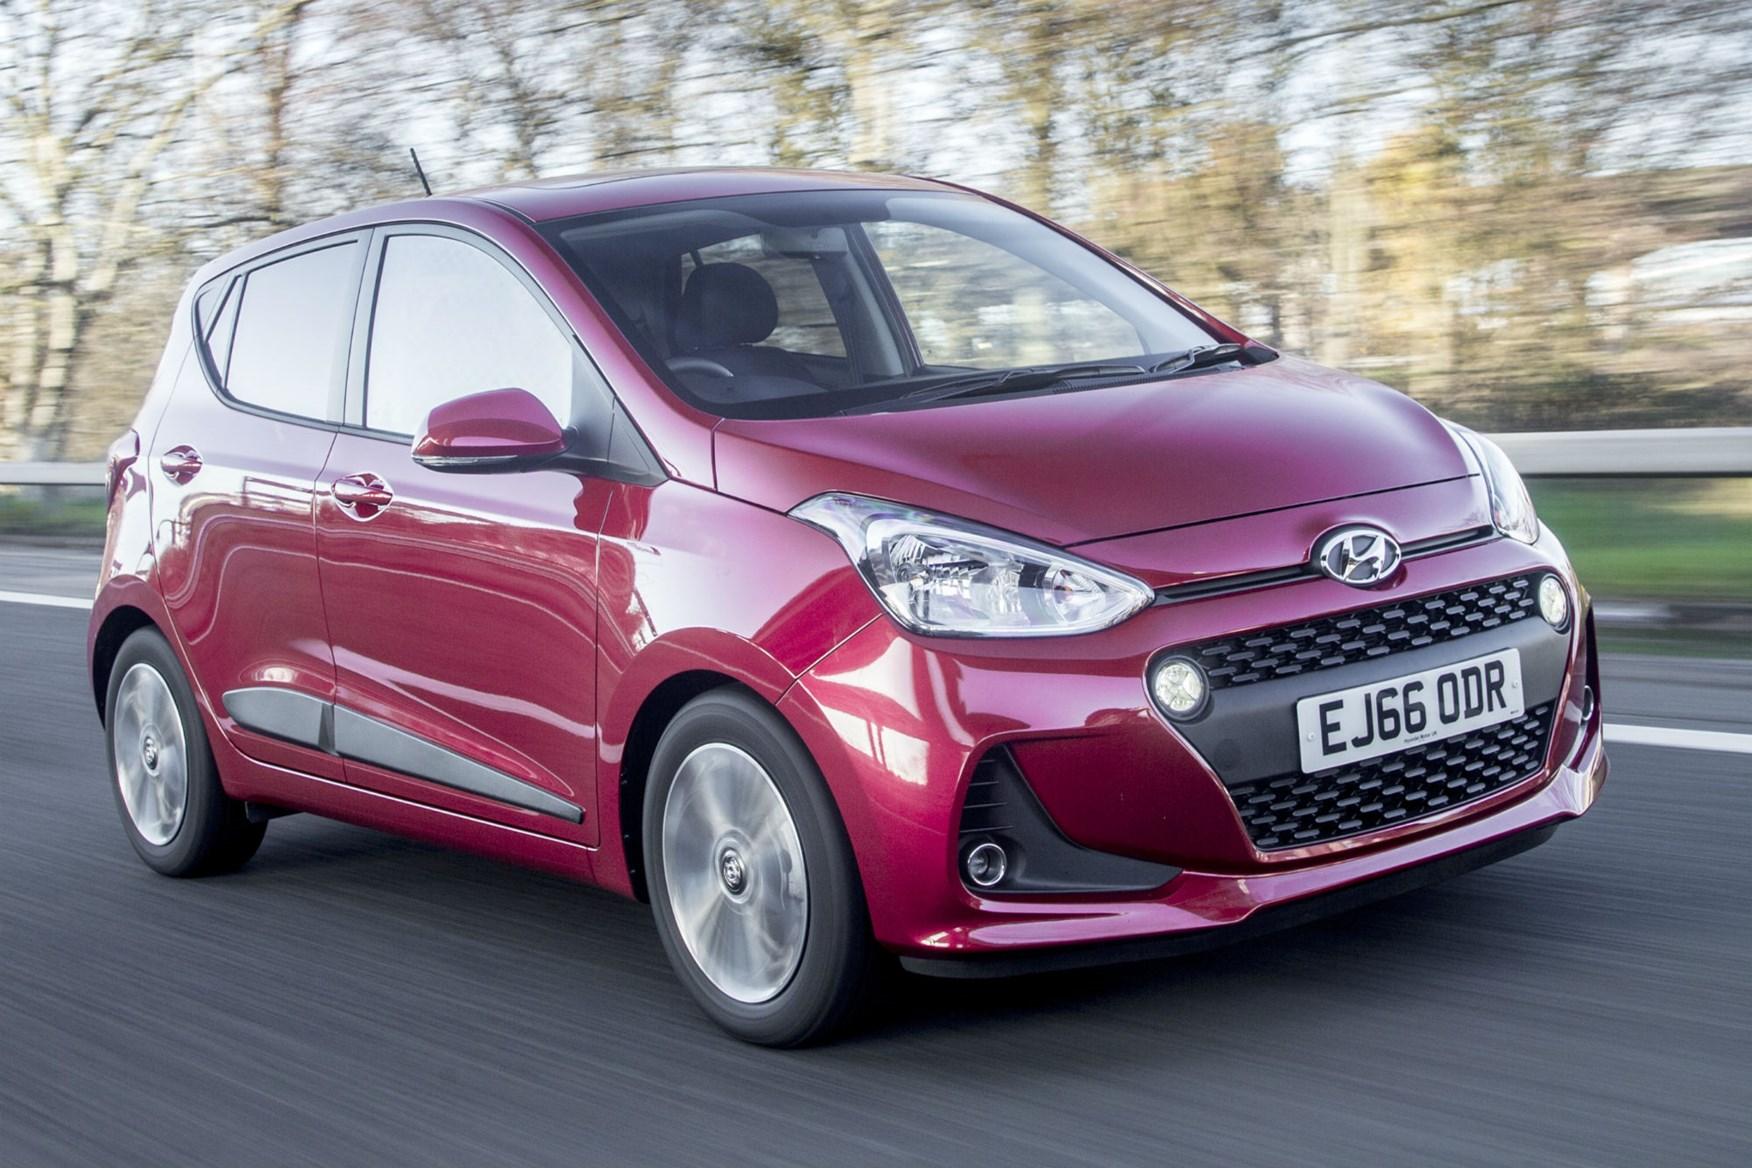 Pcp Finance Best New Car Deals For Under 163 100 Per Month